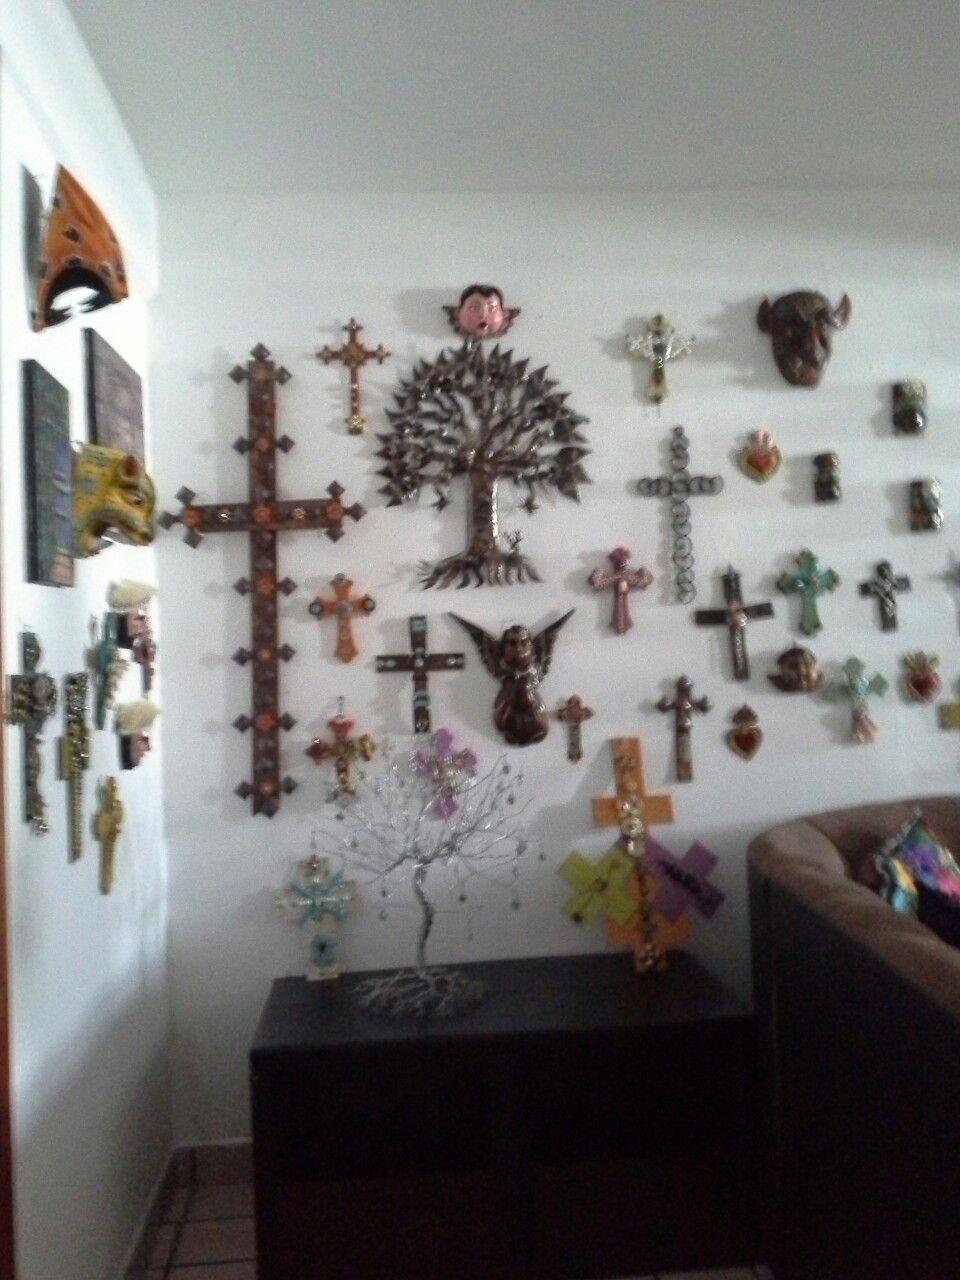 Hand painted mexican cross srosses colorful zapatisa story crosses chiapas mexico la casa de sonia ceramics crafts folk art amatinango del valle